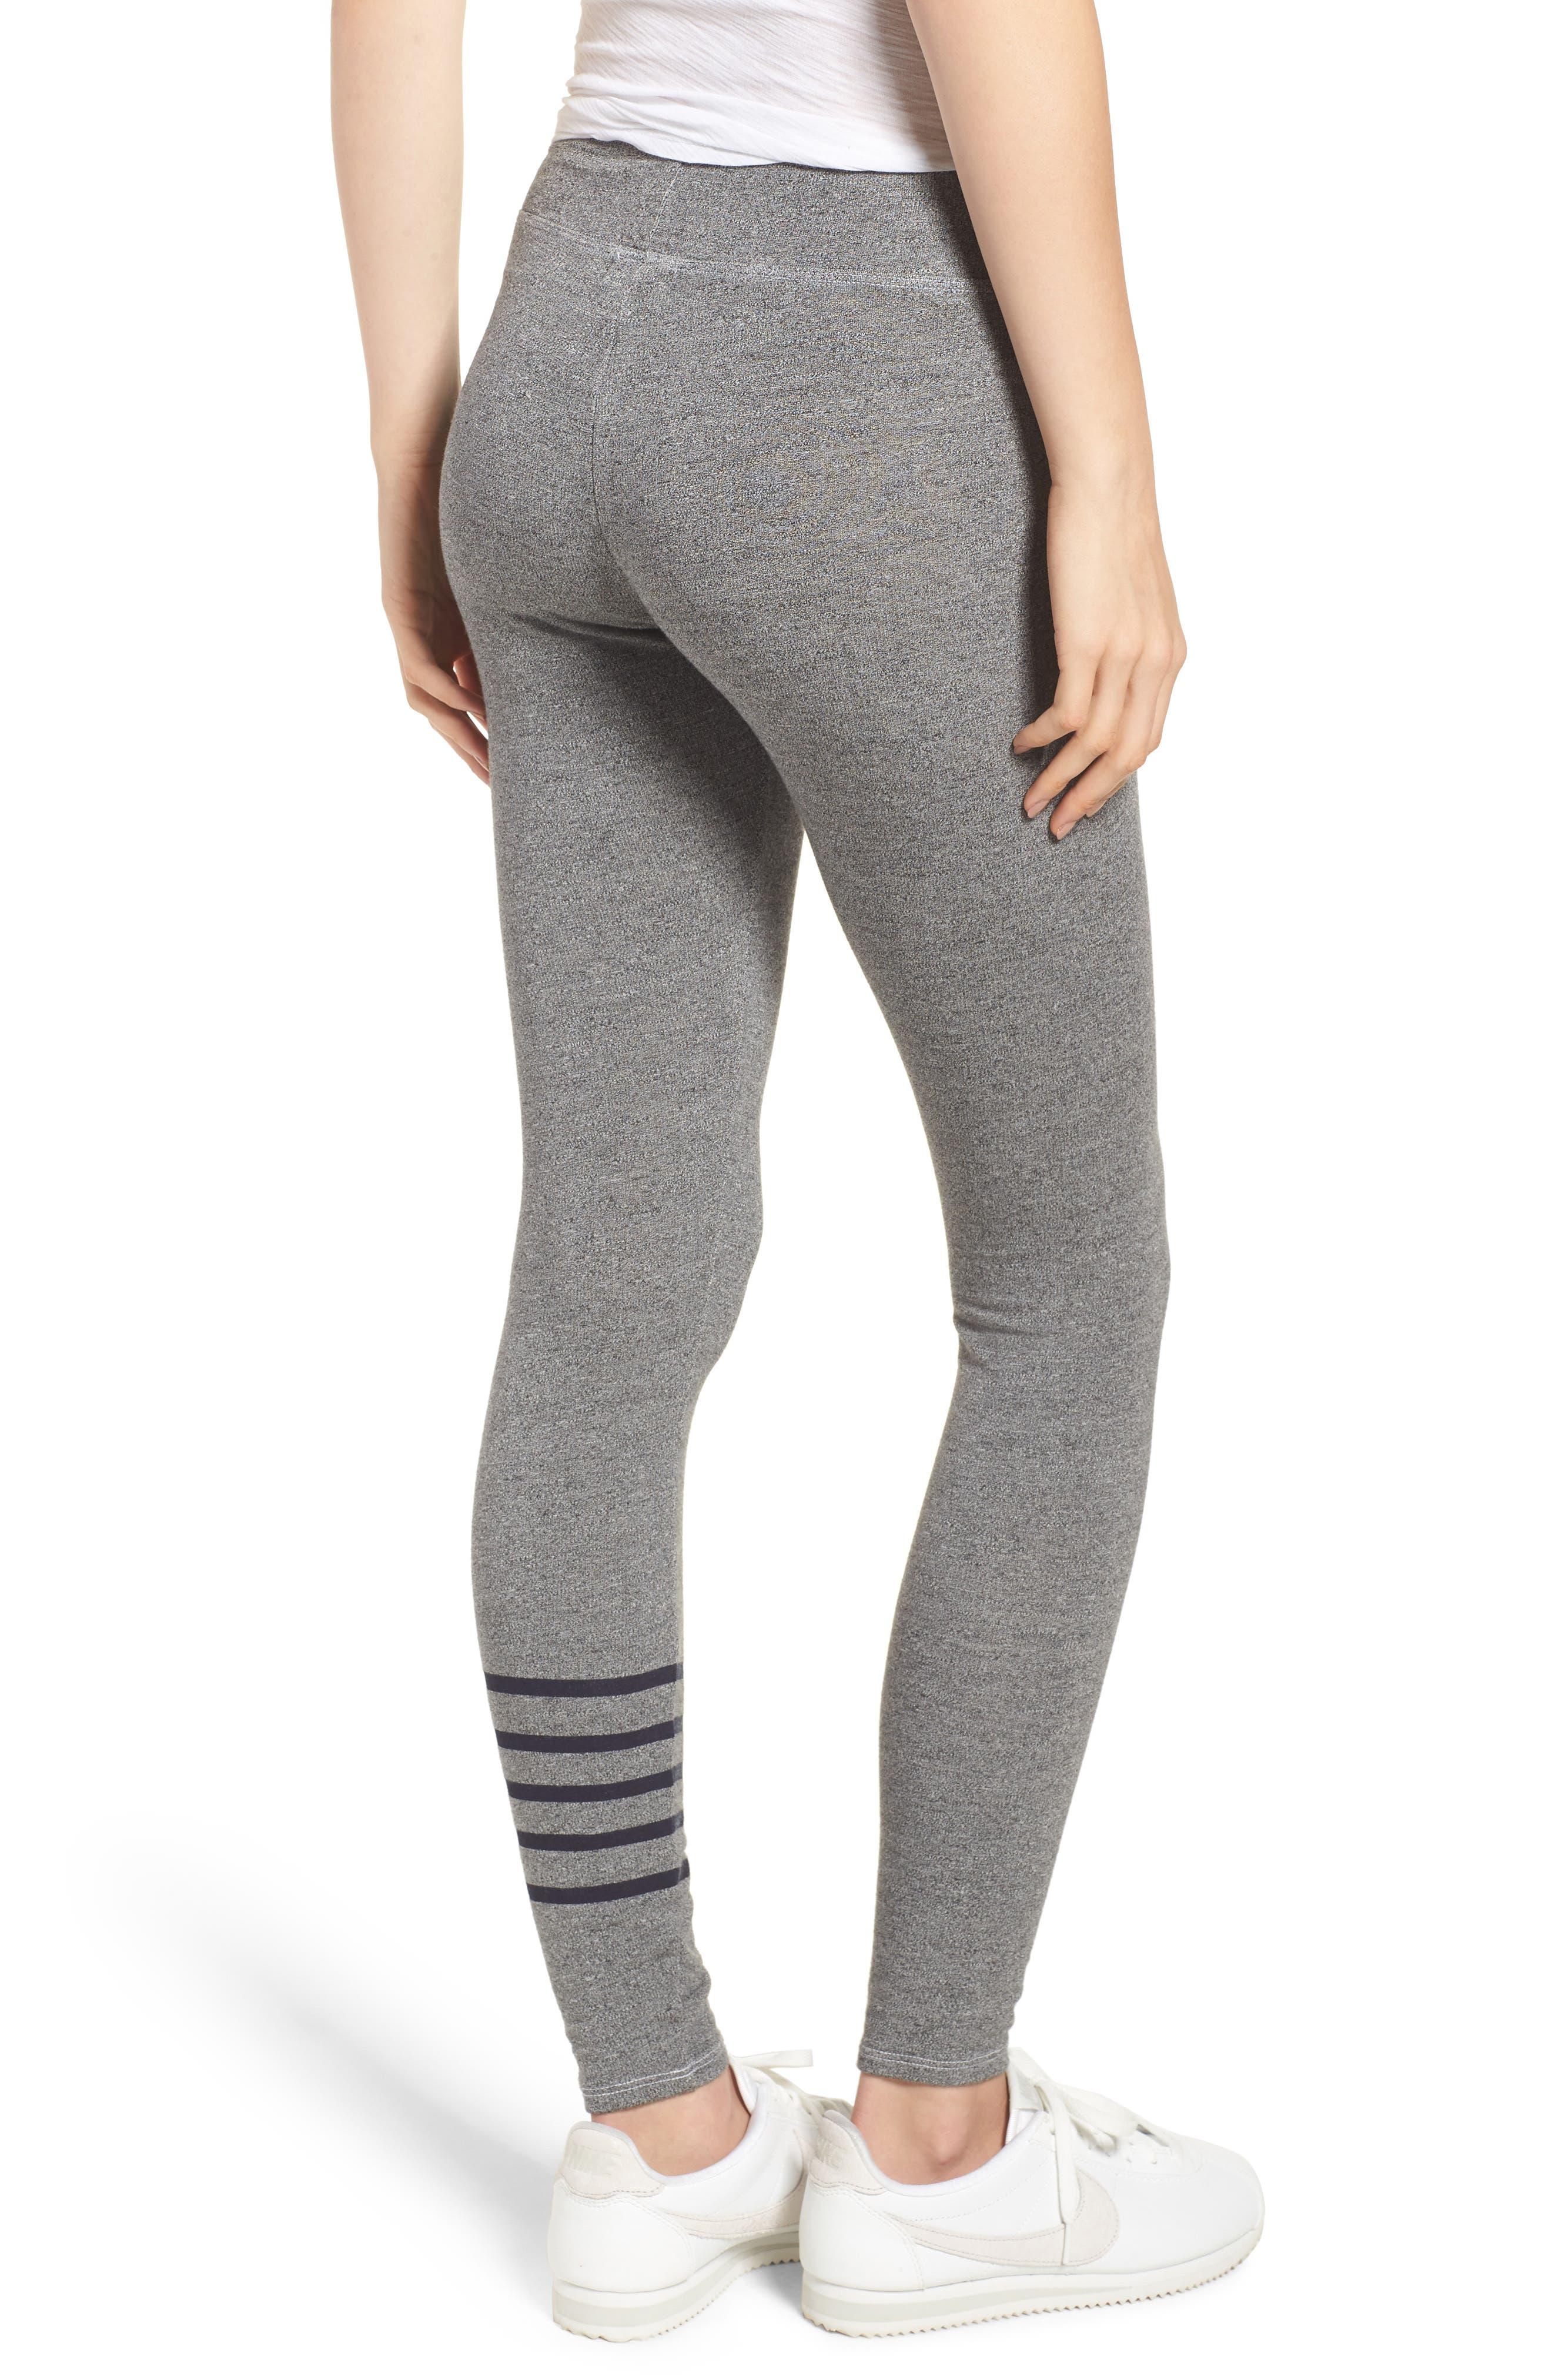 Stripe Yoga Pants,                             Alternate thumbnail 2, color,                             Heather Grey